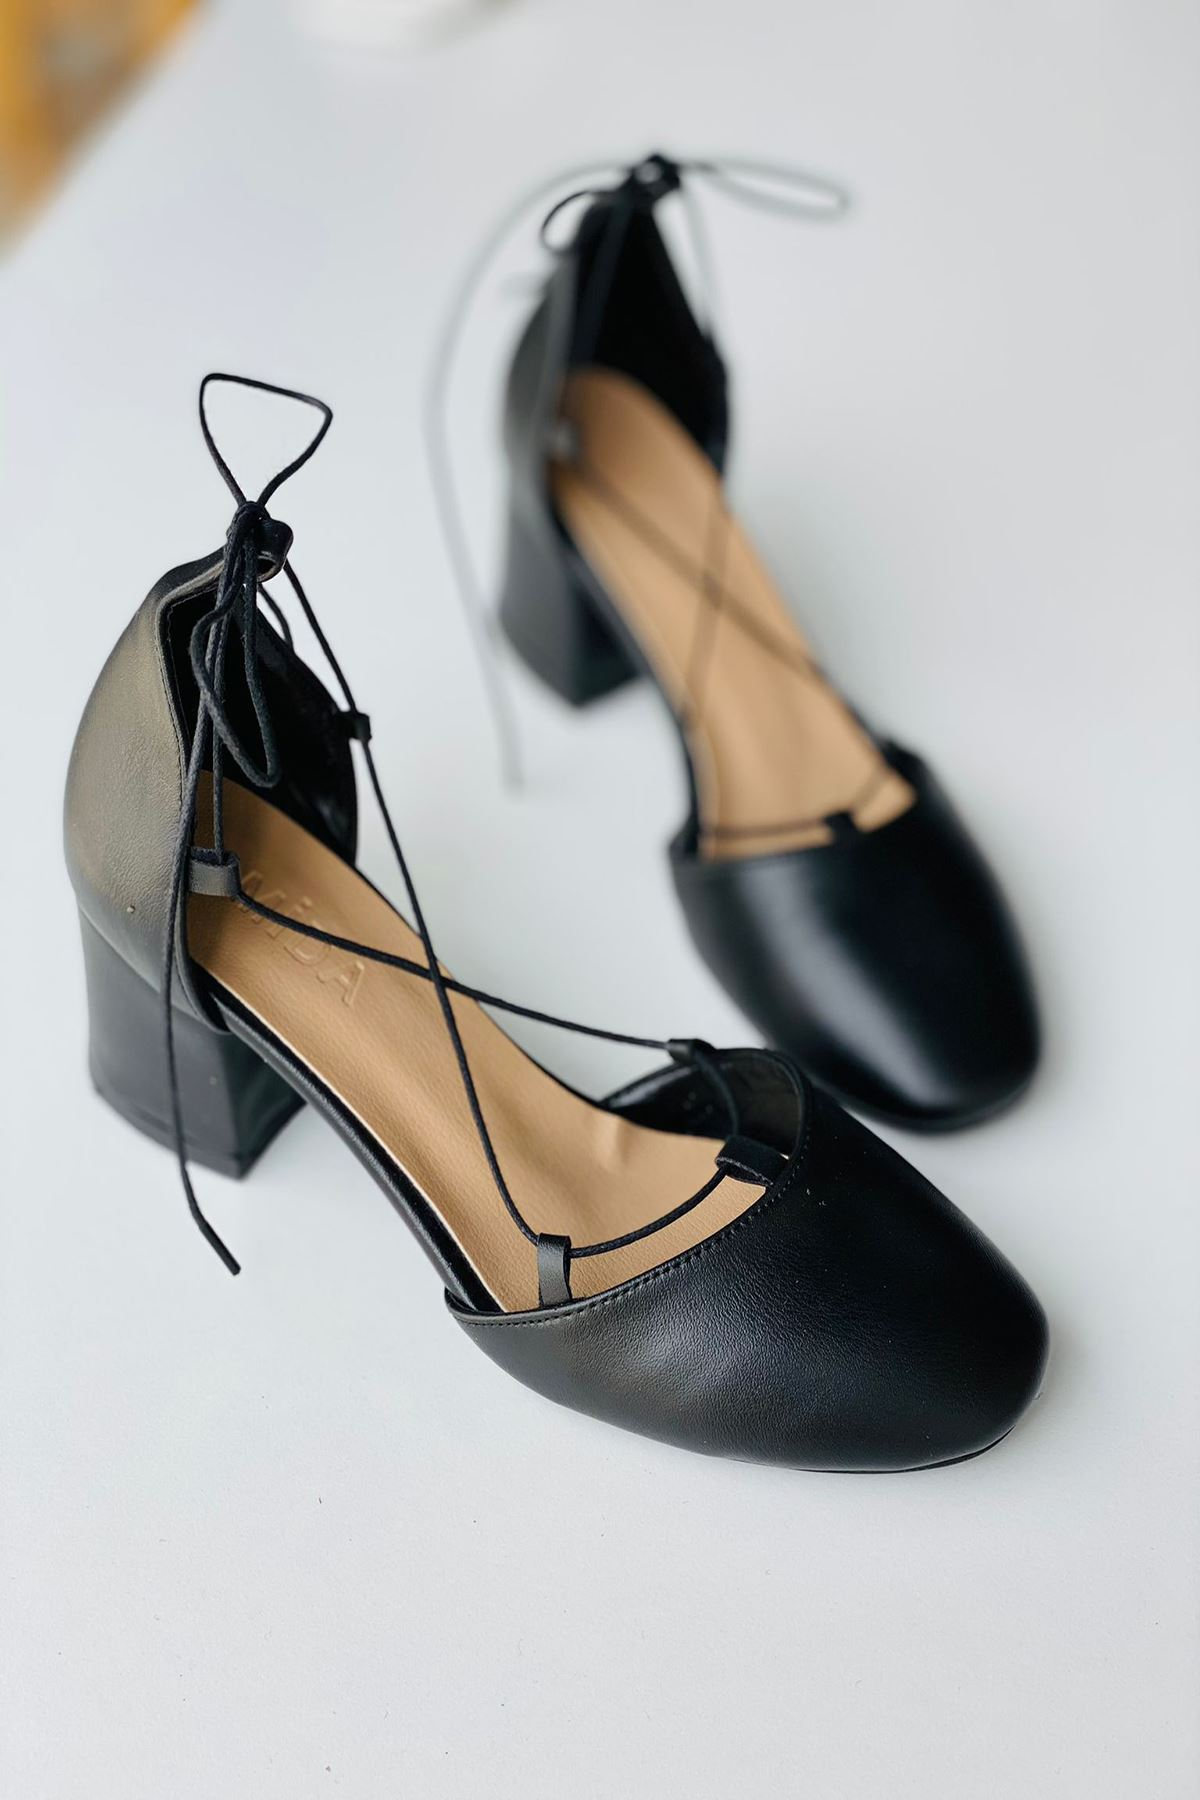 Y203 Siyah Deri Topuklu Ayakkabı